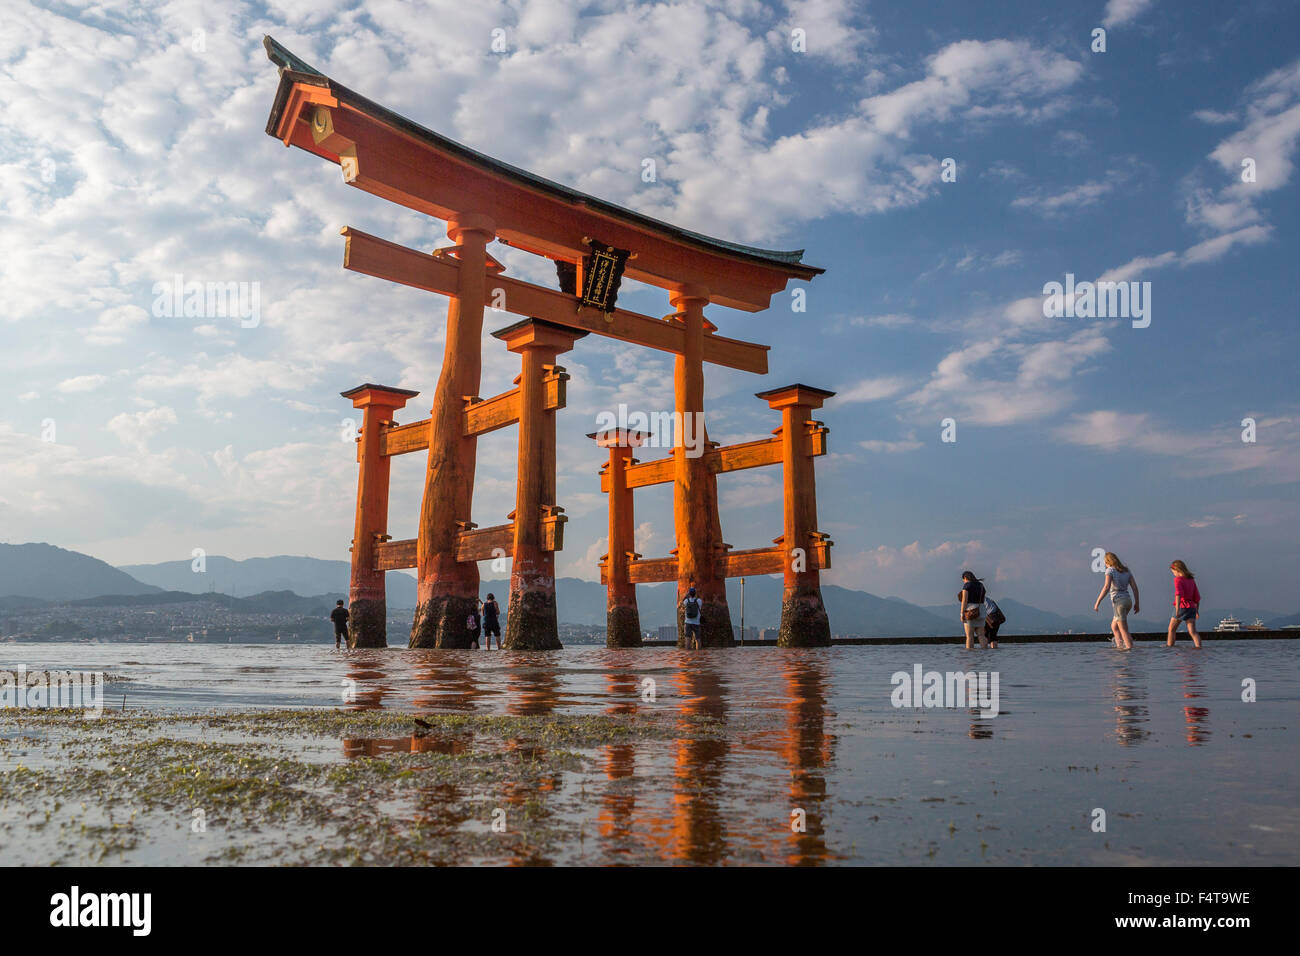 Giappone, Provincia di Hiroshima, Myajima Isola, Utsukushima Santuario, il Gate Foto Stock